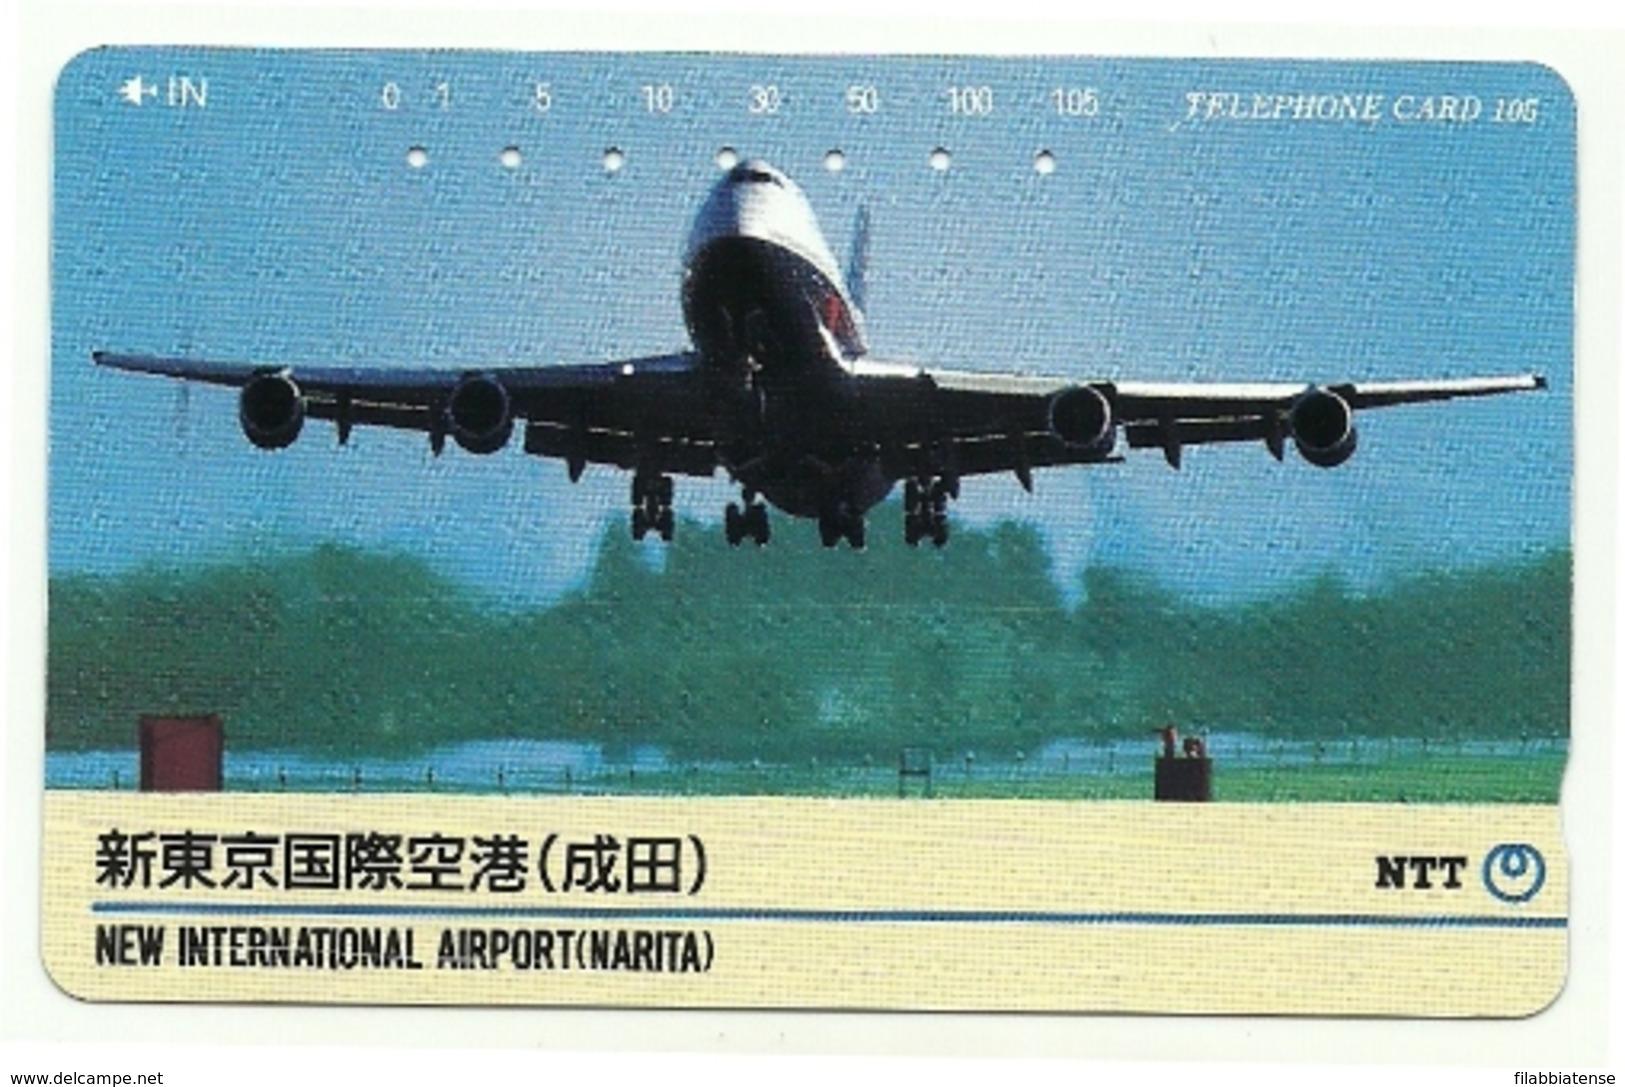 Giappone - Tessera Telefonica Da 105 Units T184 - NTT, - Avions